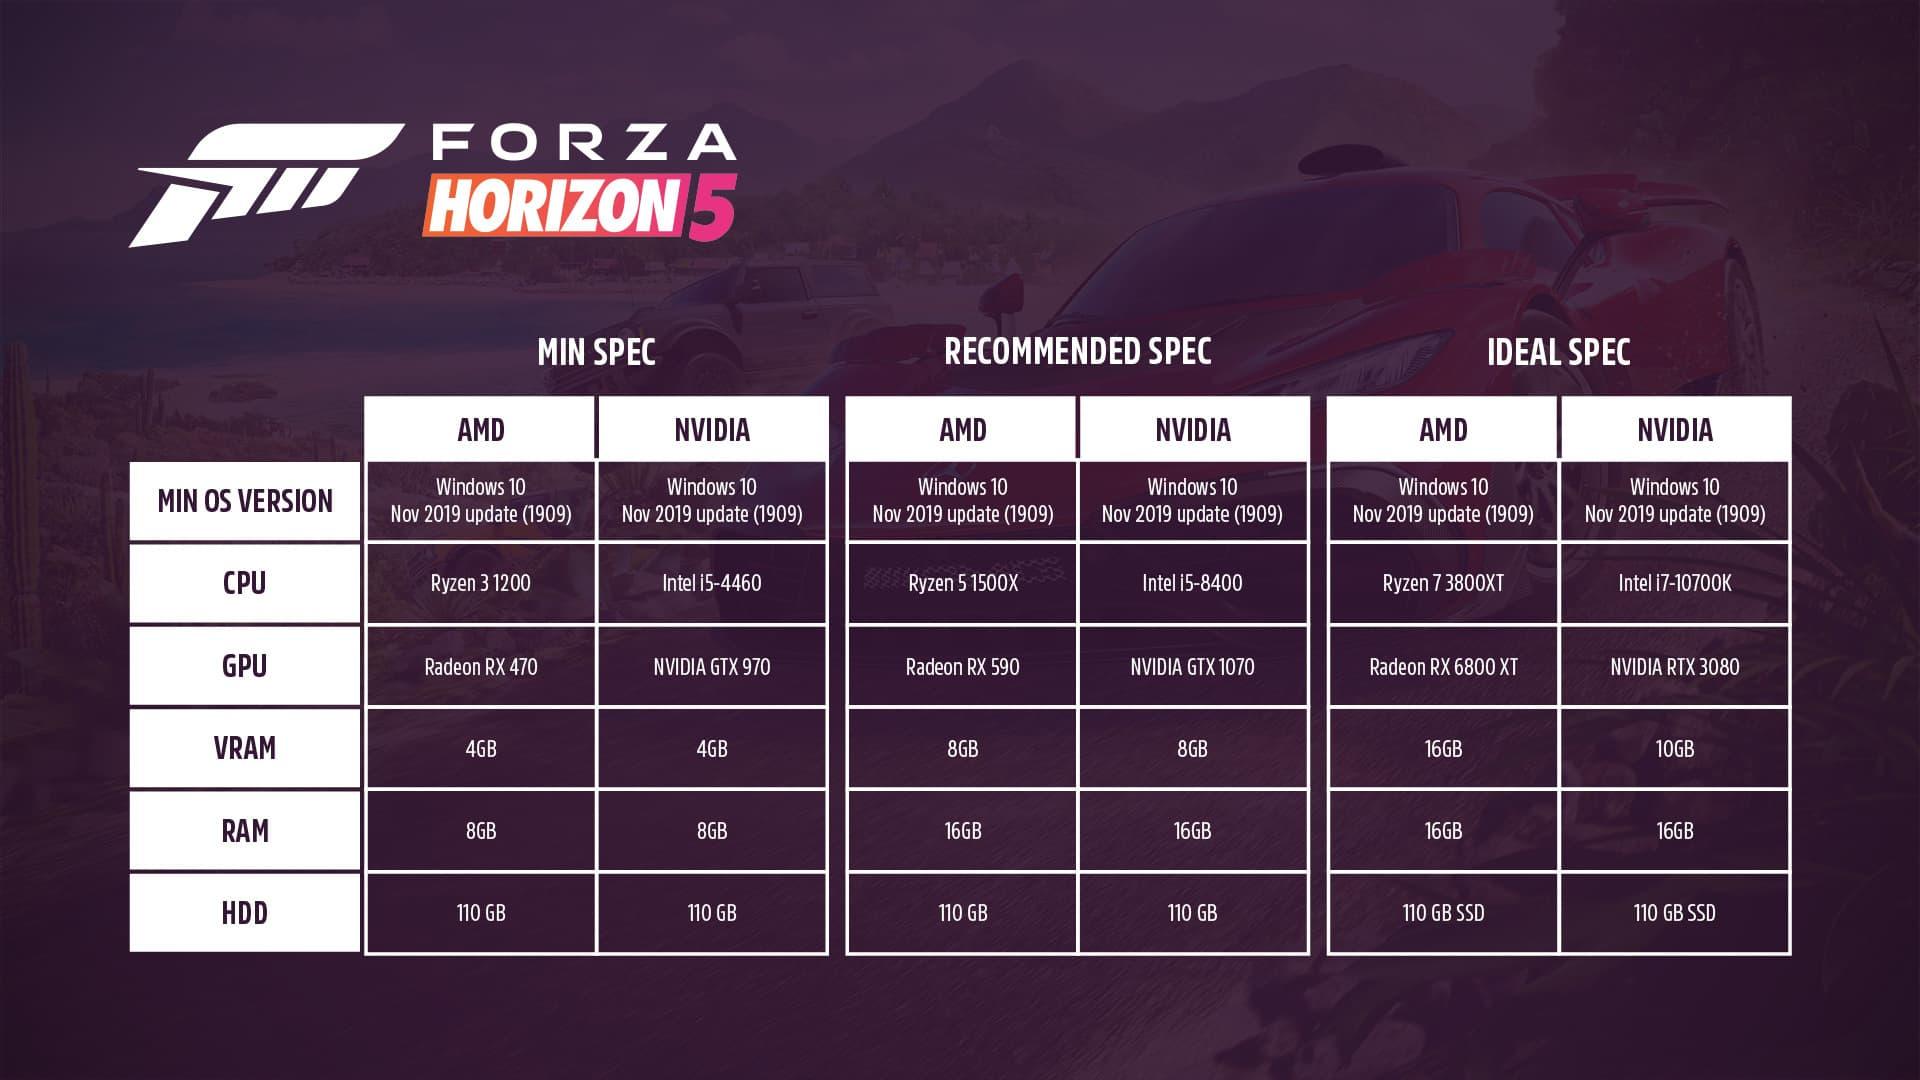 Forza Horizon 5 will be quite demanding on PC